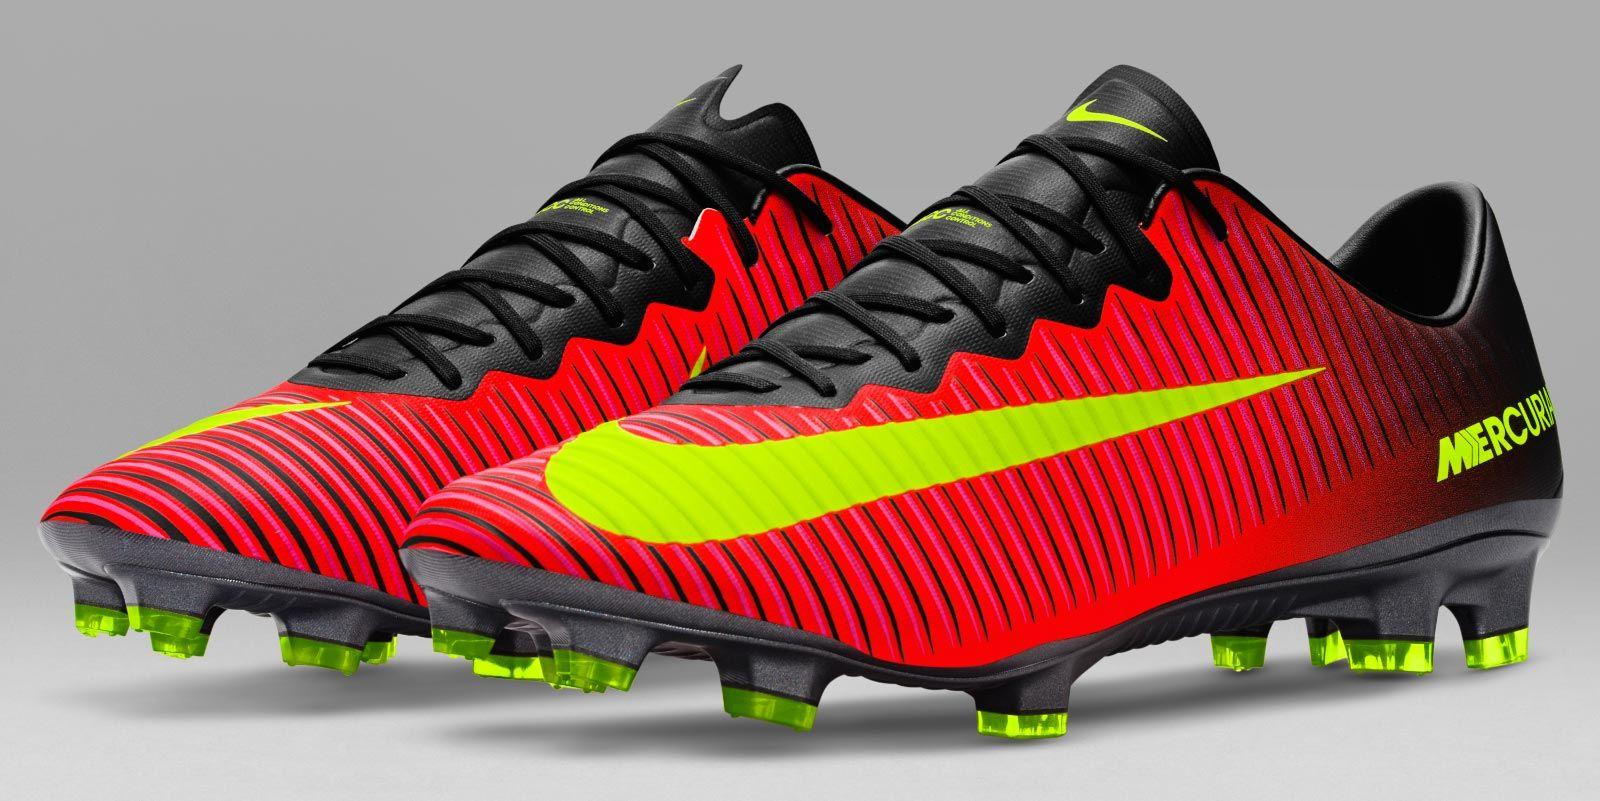 0fe28be5baa6 The next-gen Nike Mercurial Vapor XI 2016 boots introduce a bold design